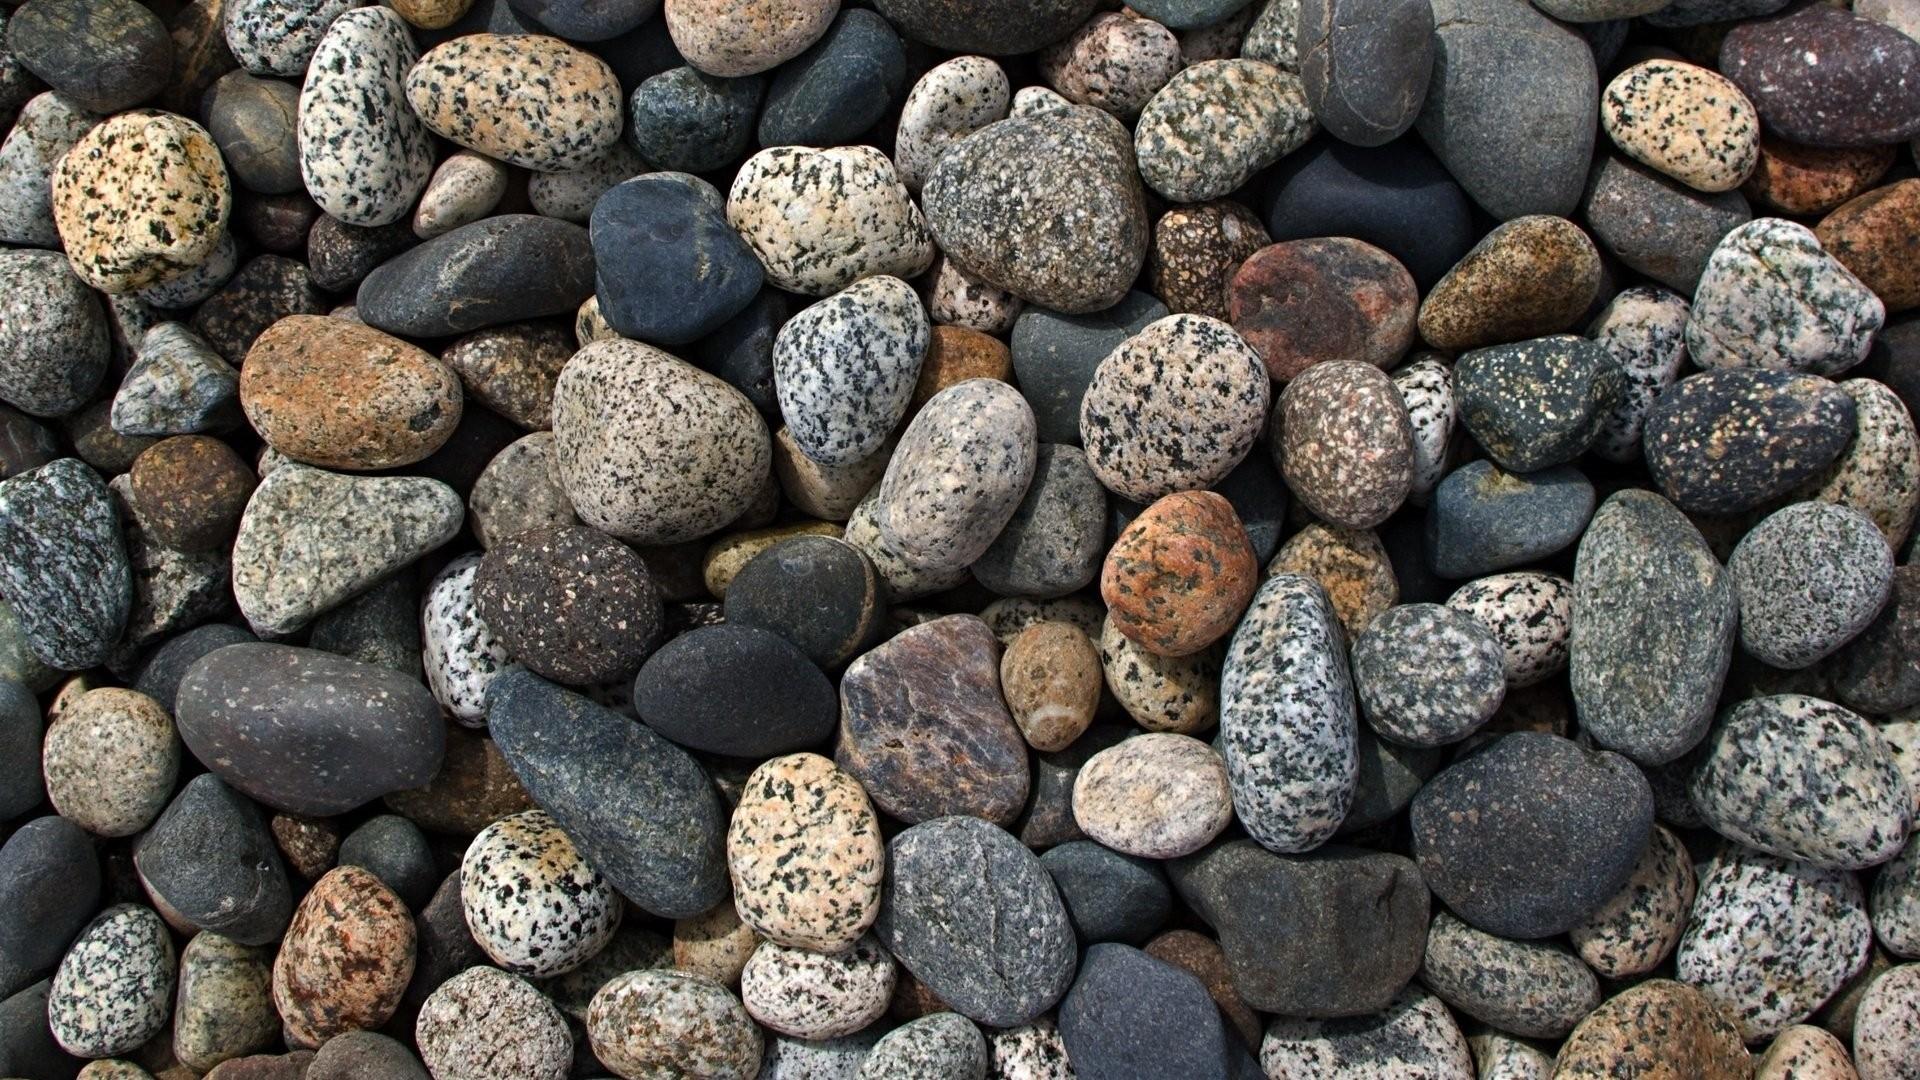 Stones wallpaper for desktop